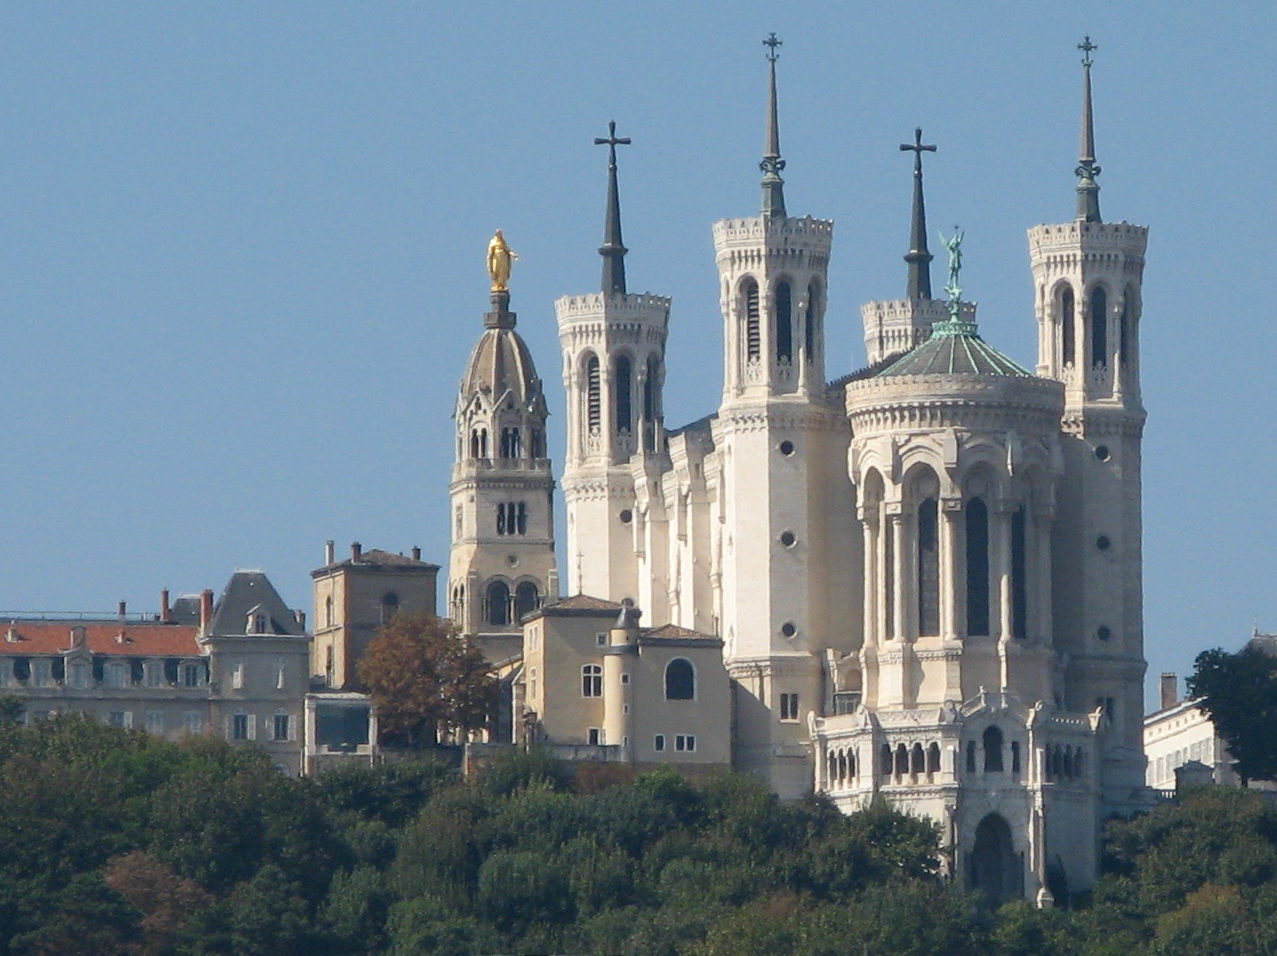 Базилика Нотр-Дам-де-Фурвьер, Лион